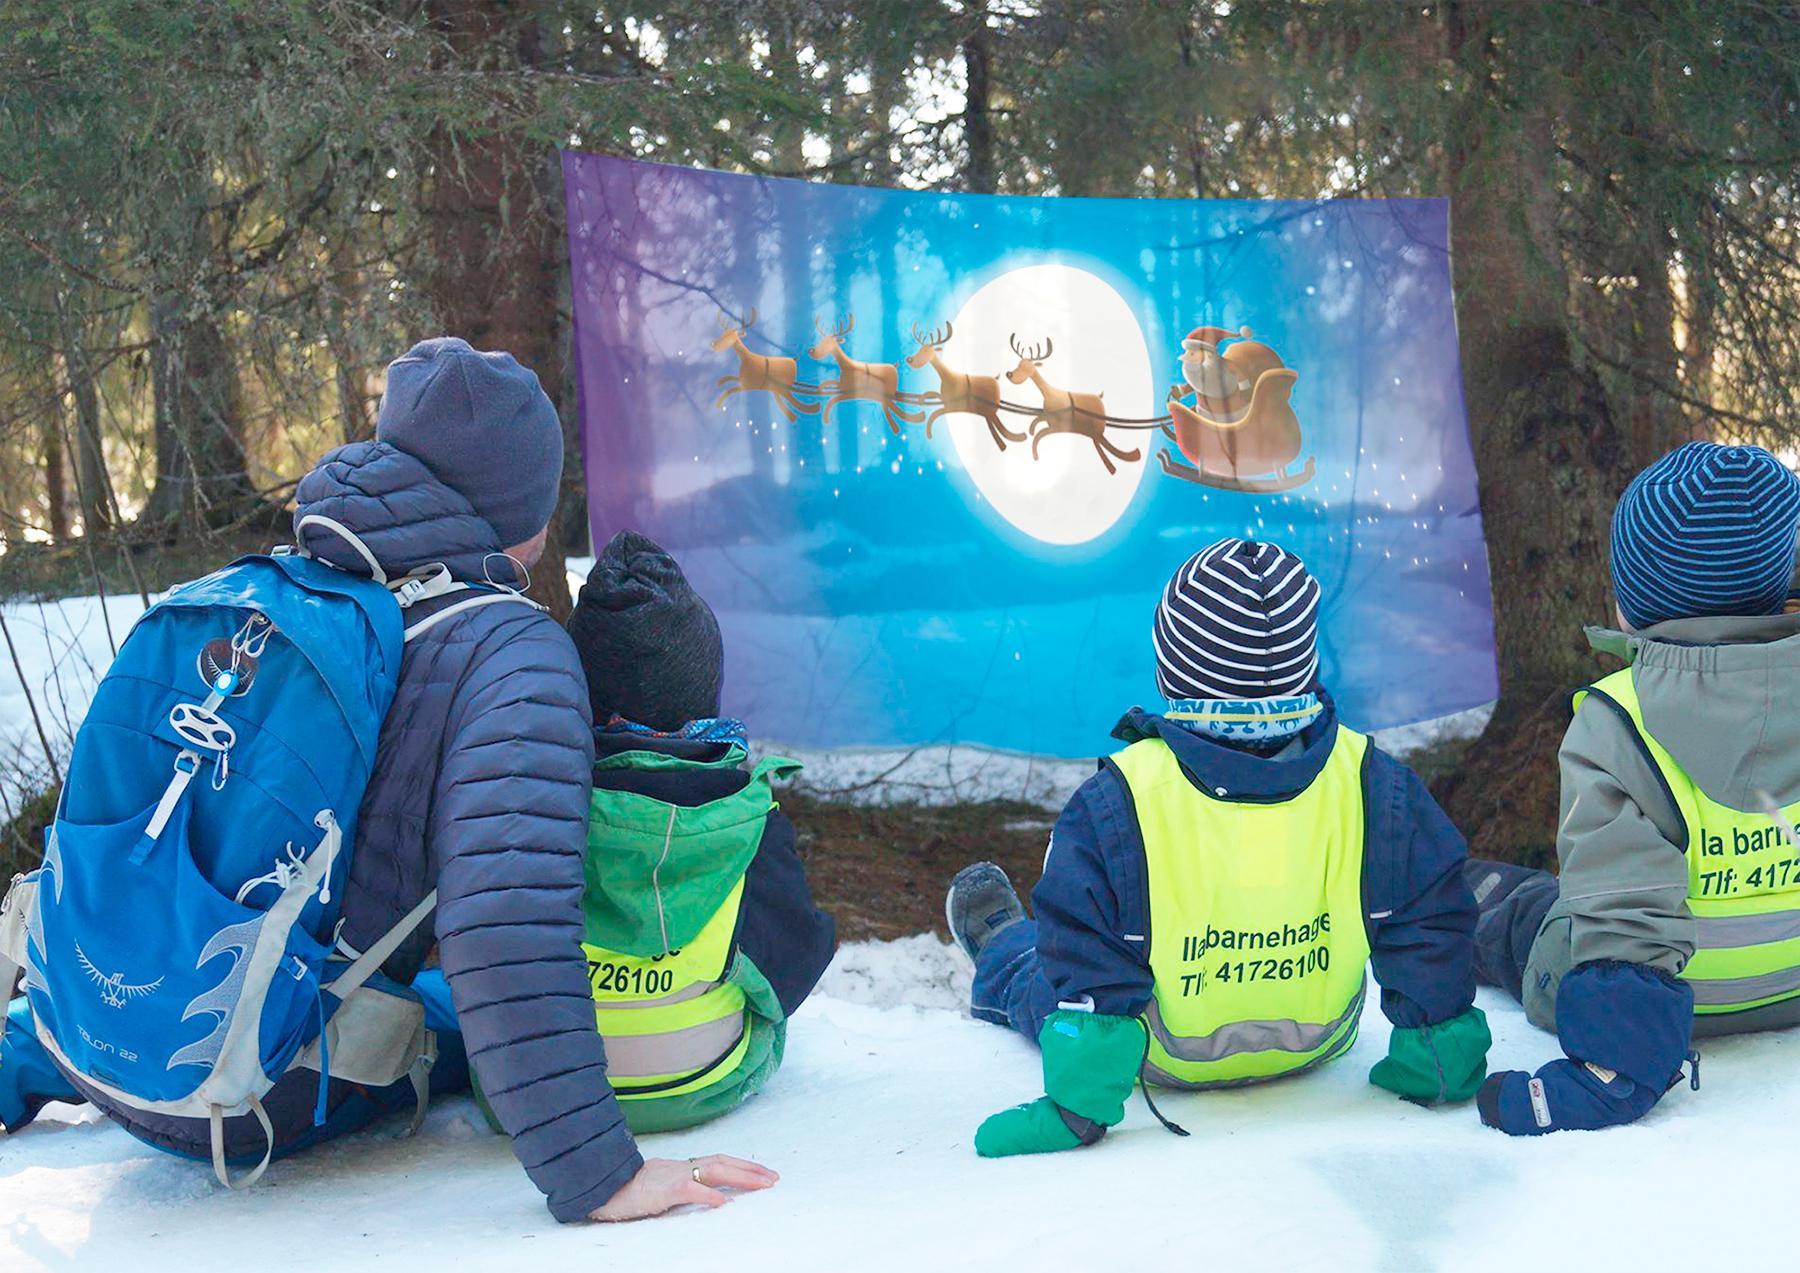 Barnehagebarn ser på film med prosjektor i skogen